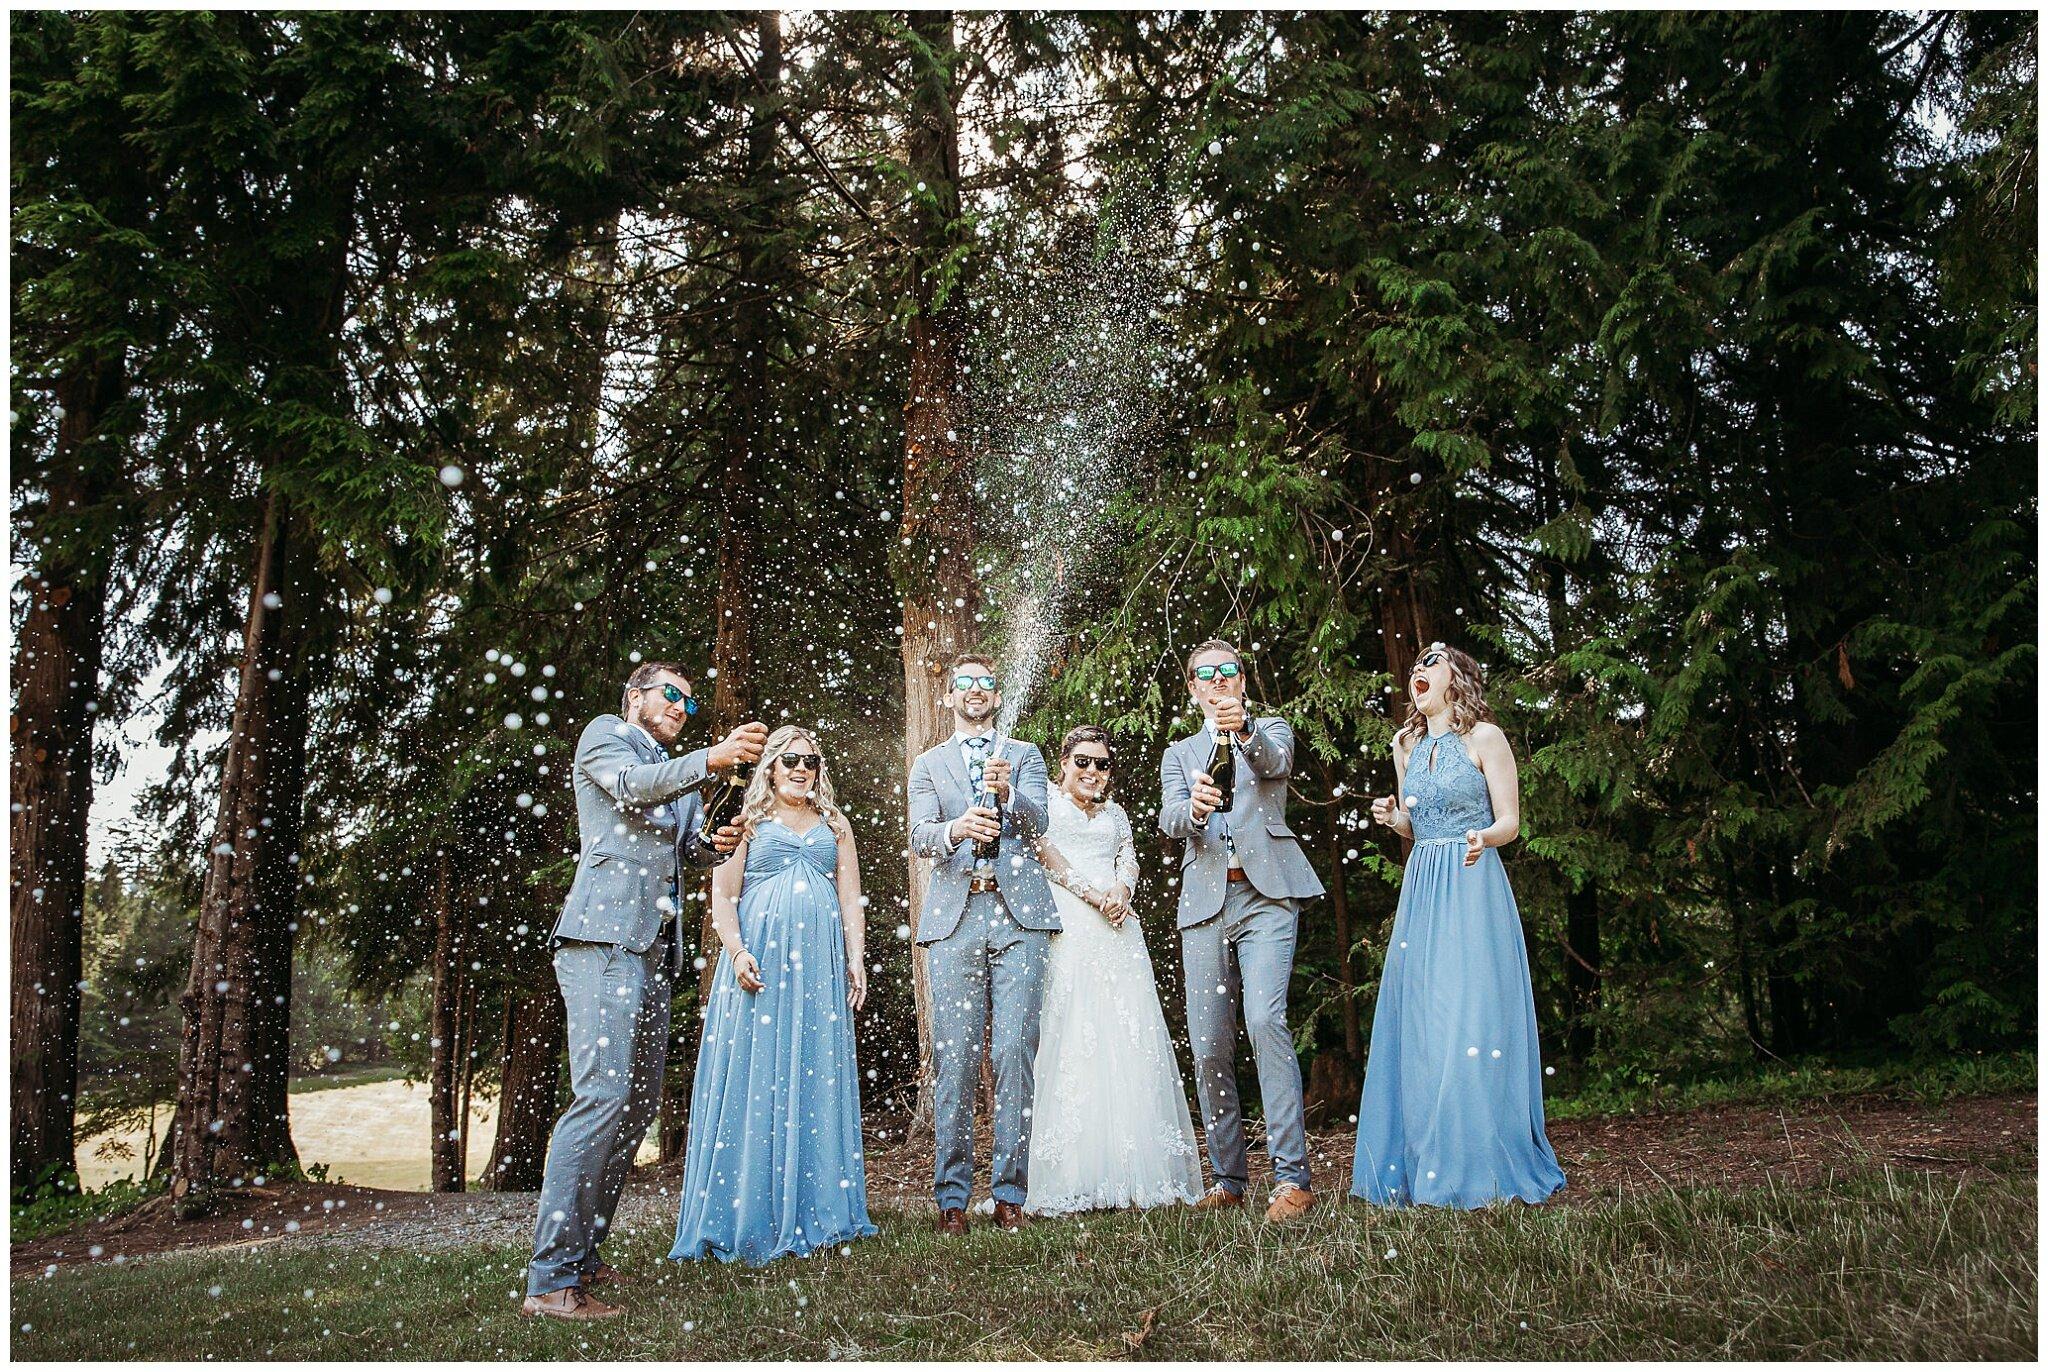 Eighteen Pastures Mission  BC Abbotsford BC Christian Wedding Photographer Summer Bride Groom Inspo_0023.jpg